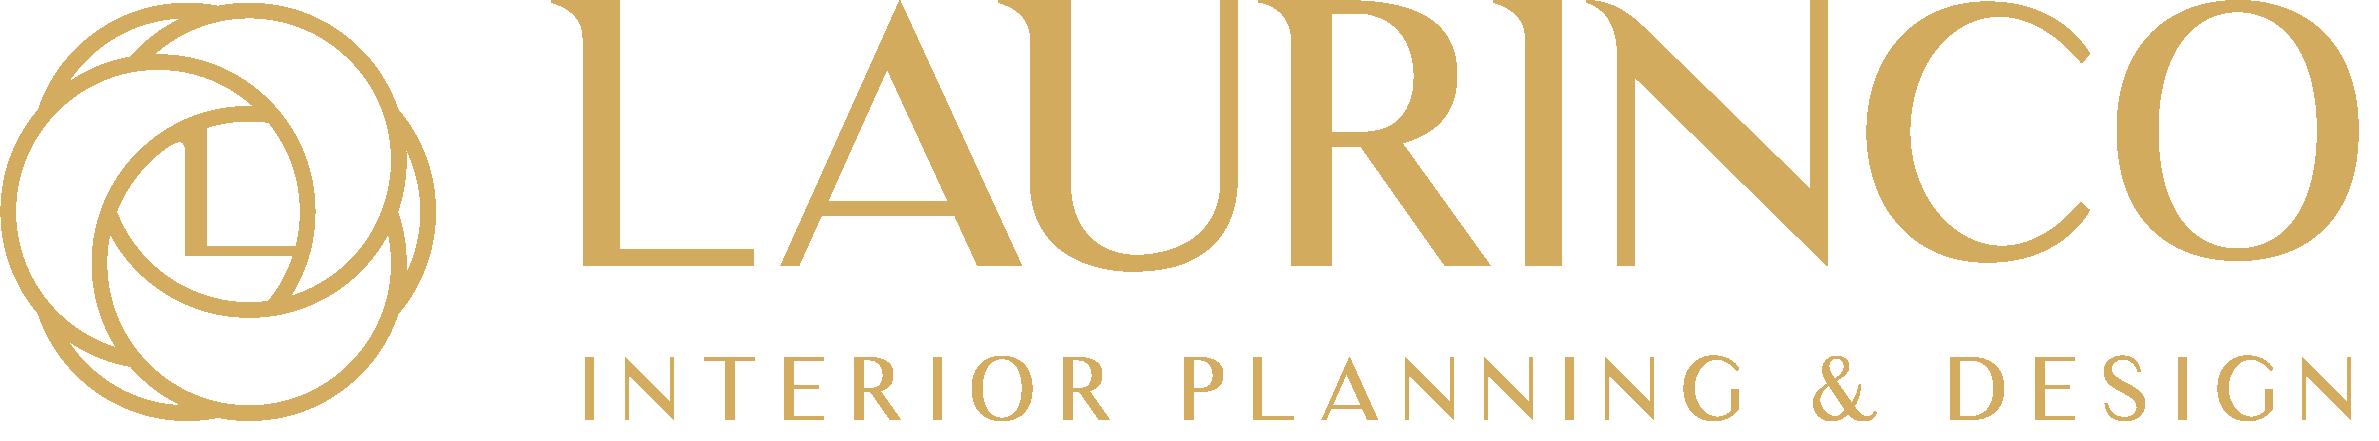 Laurinco Logo